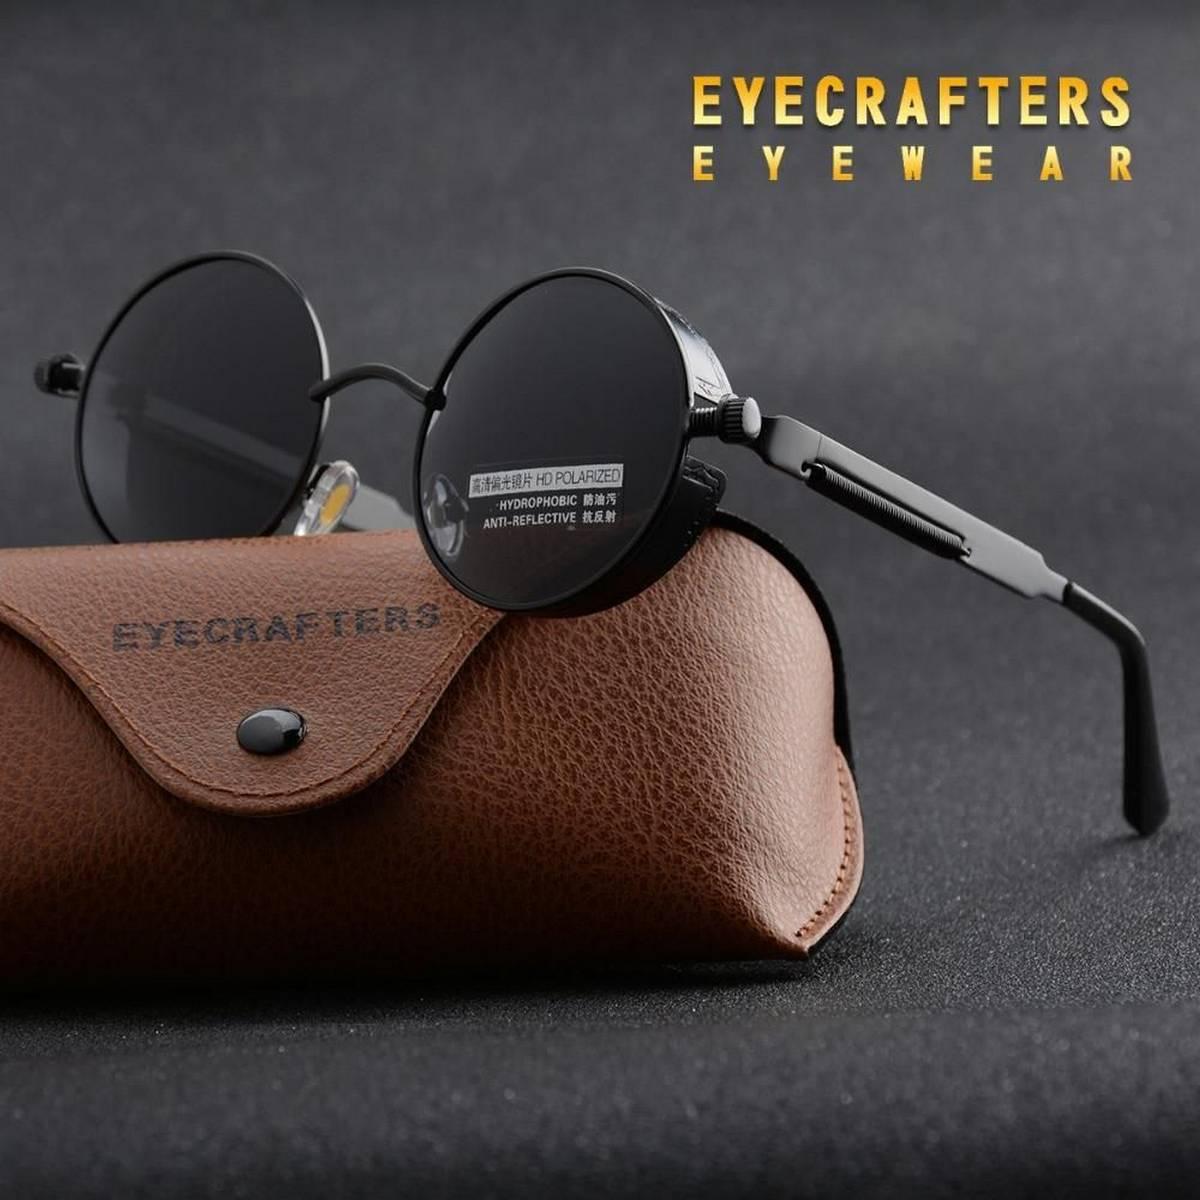 Black Lens Sunglasses Polarized Glass Lens Vintage Eyewear Accessories Sun Glasses For Men And Women